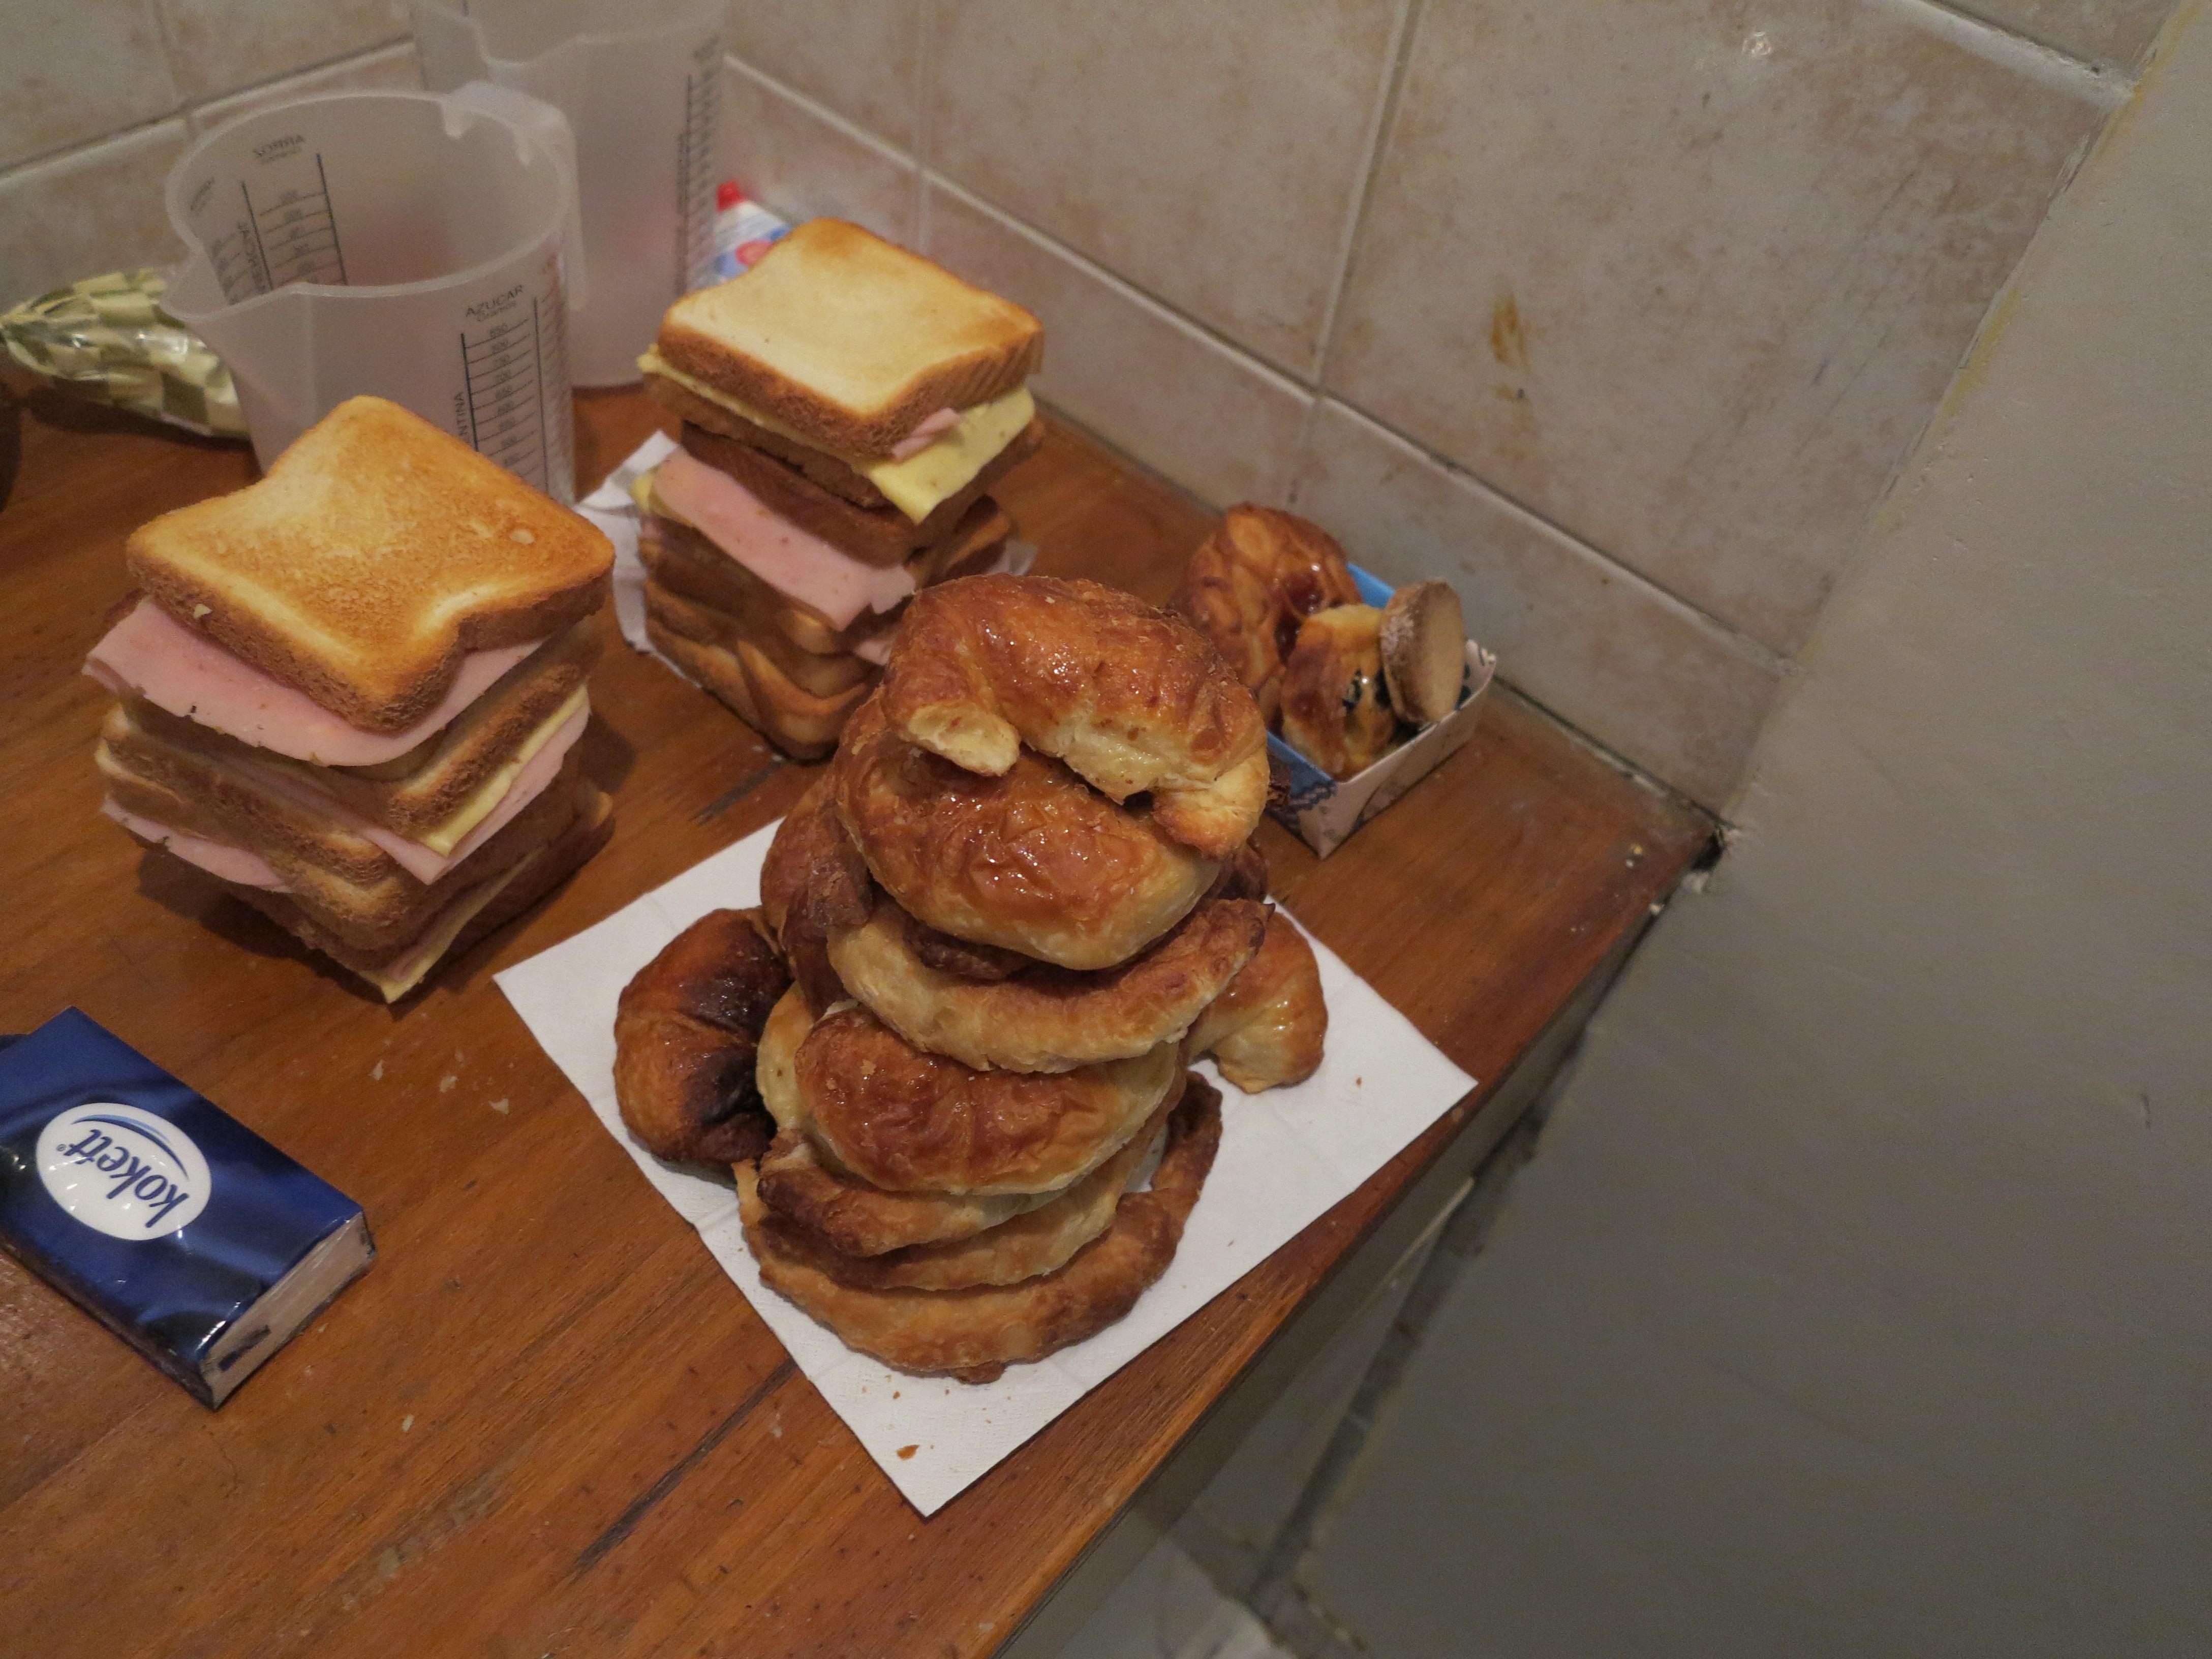 30.11.16 Geklautes Frühstück